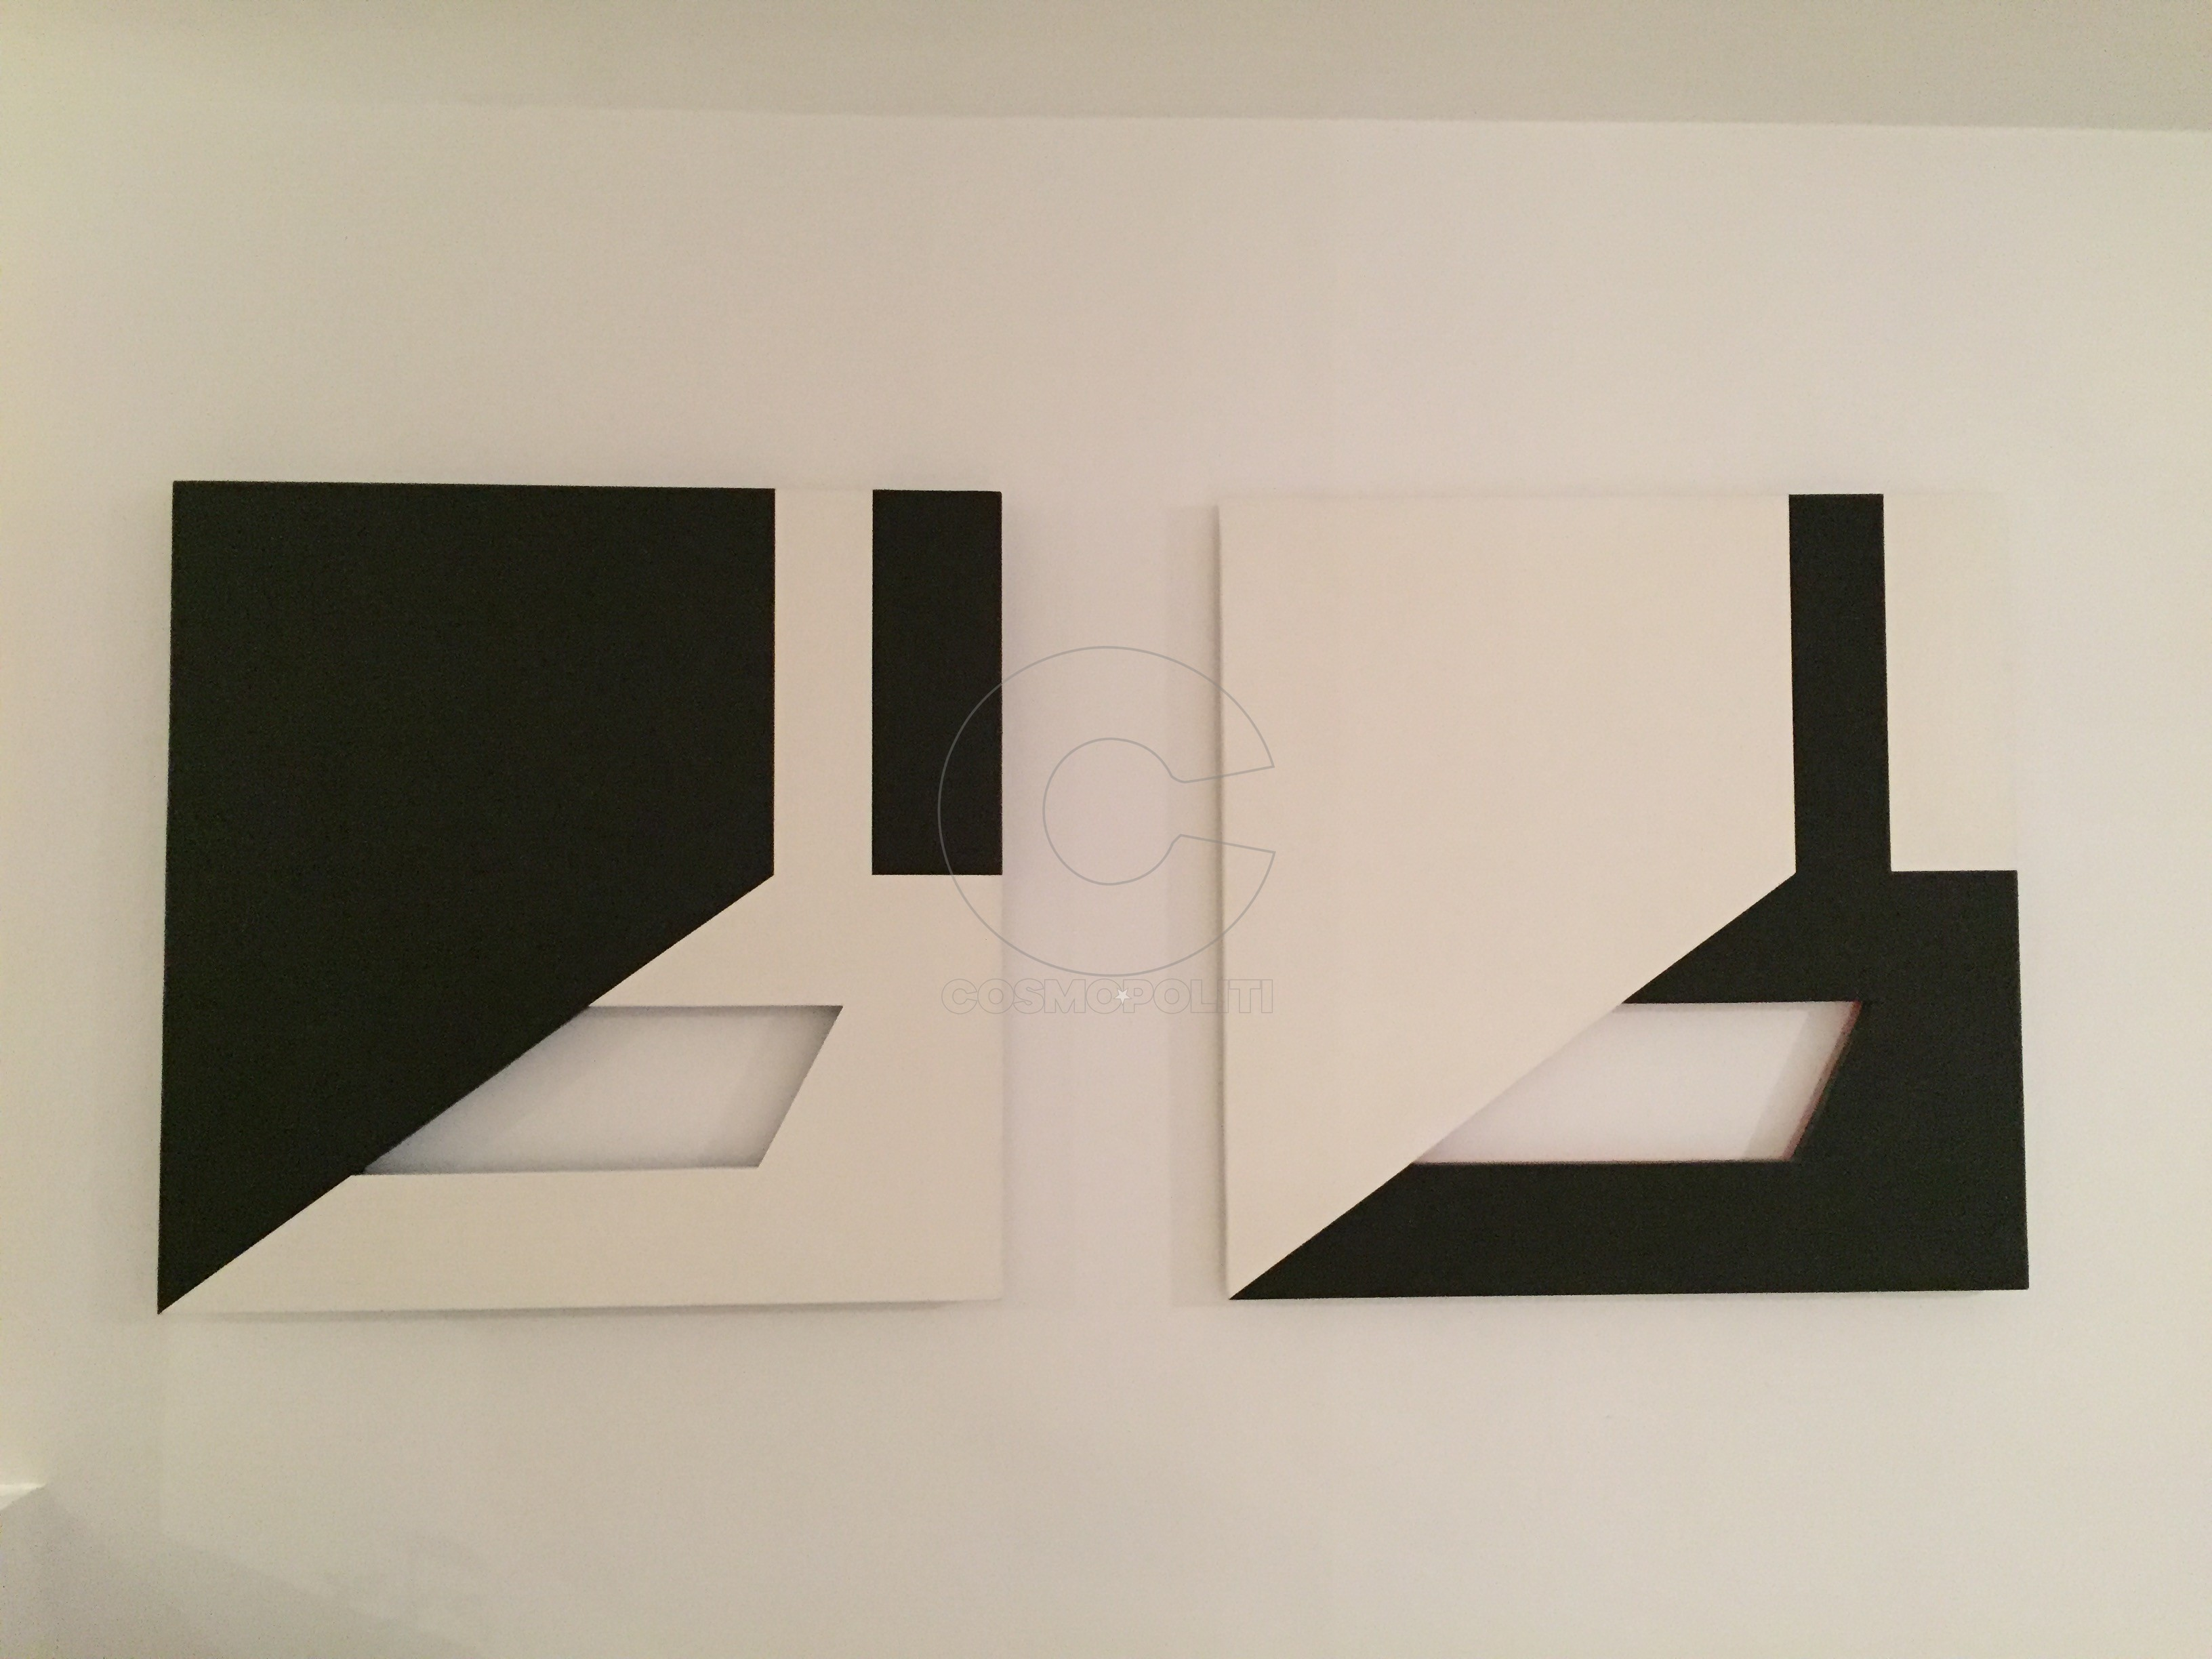 Espace positif-Espace negatif 1979 ακρυλικό σε ξύλο 75x75 cm x2